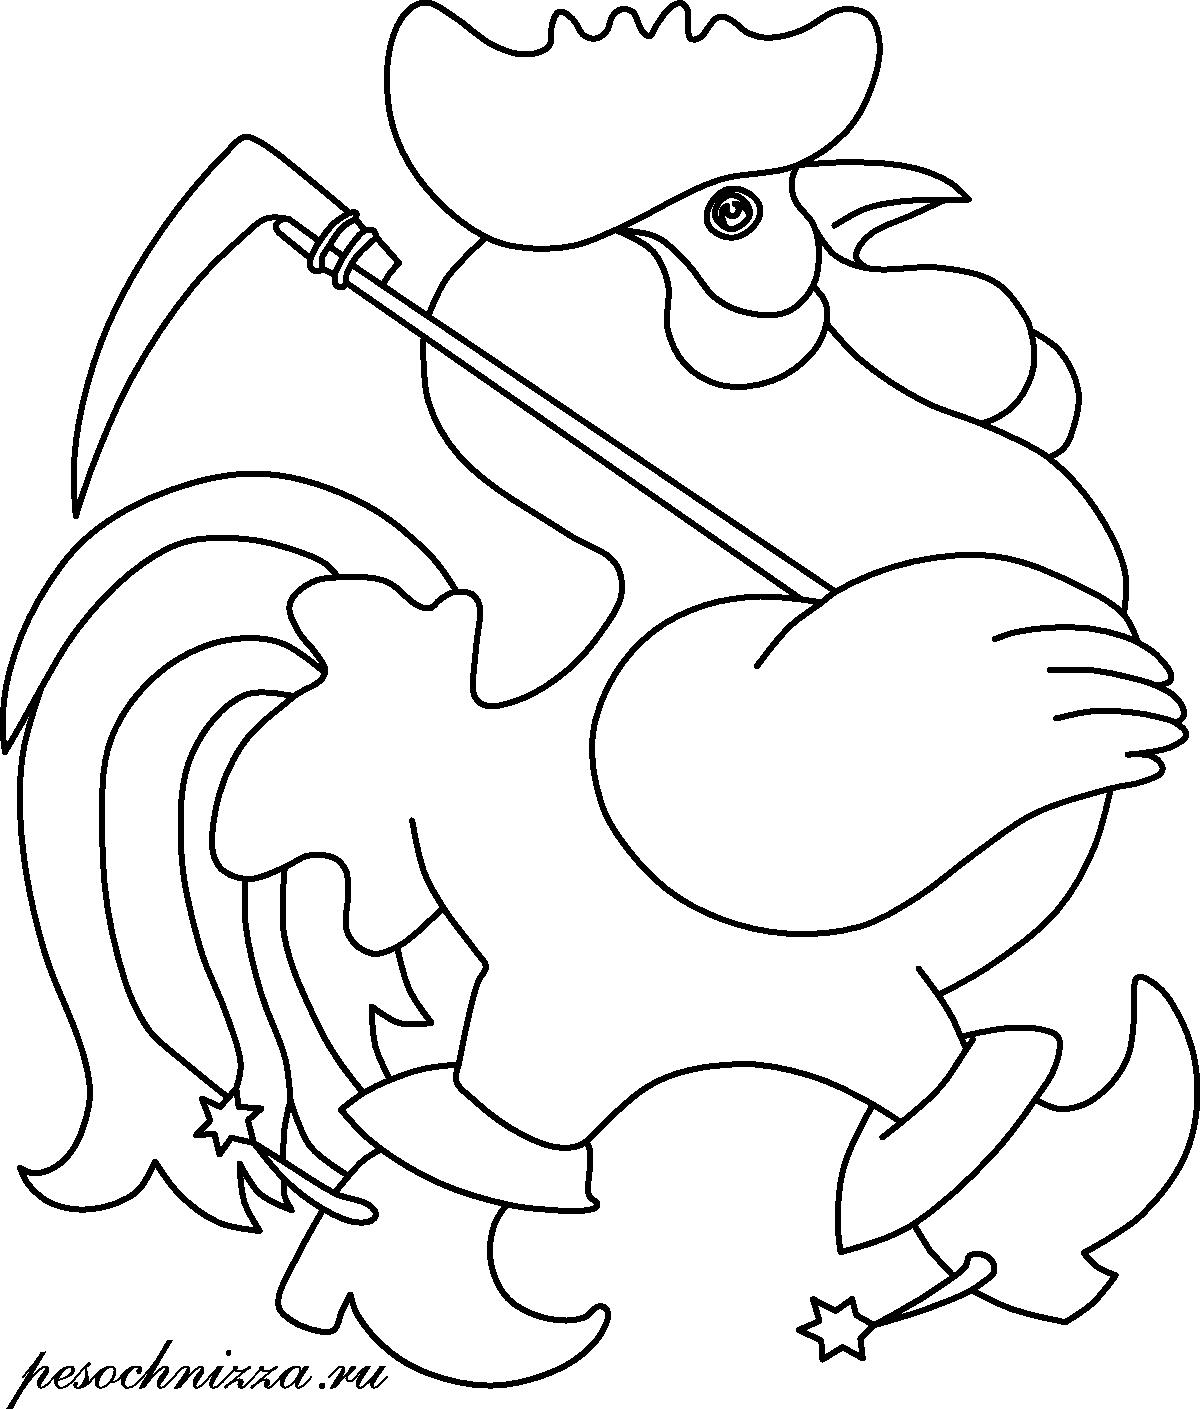 овощи картинки шаблон из сказок изготовление